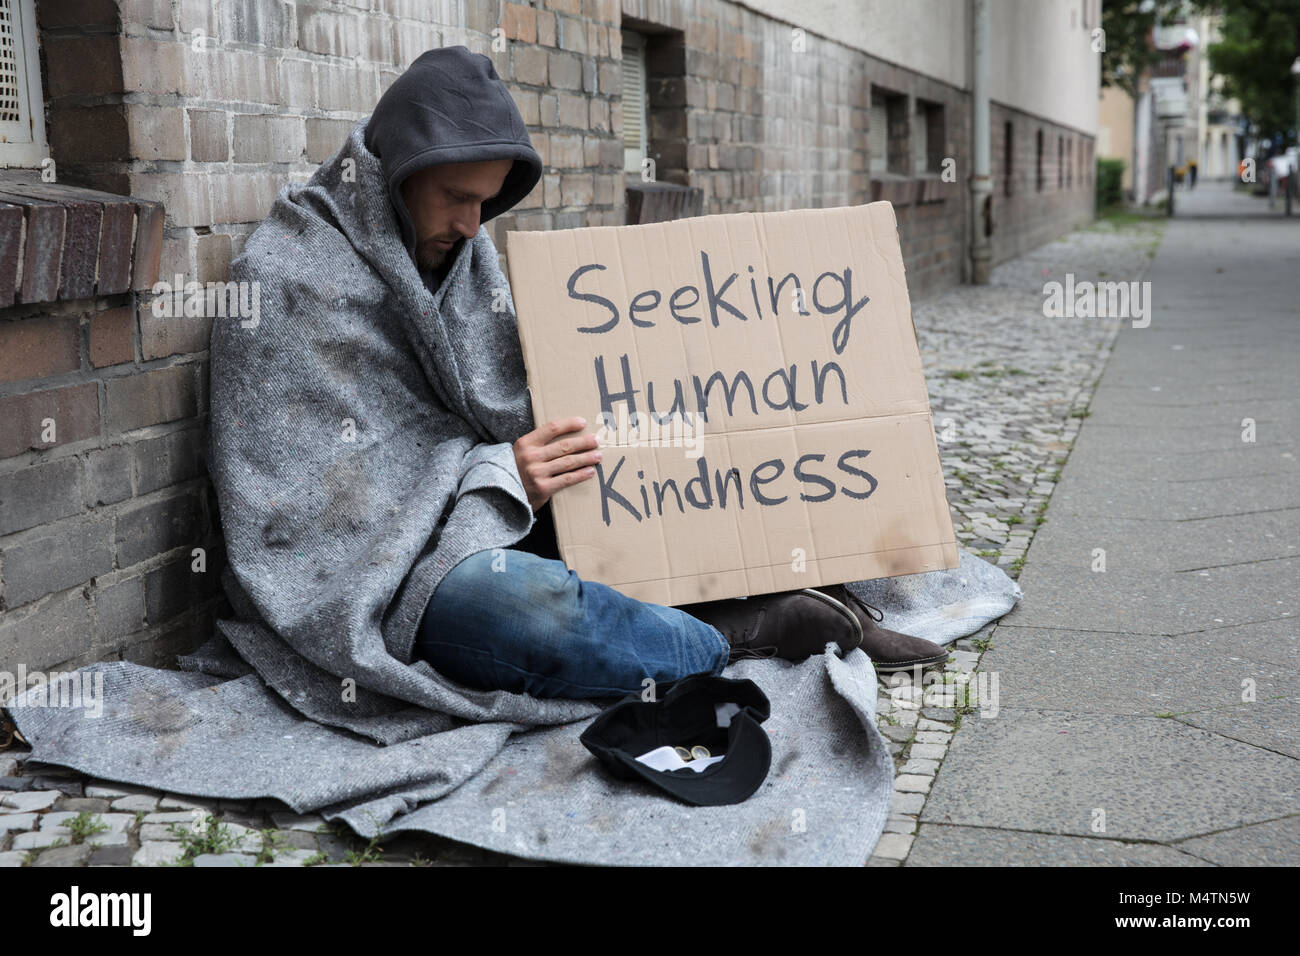 Male Beggar In Hood Showing Seeking Human Kindness Sign On Cardboard - Stock Image